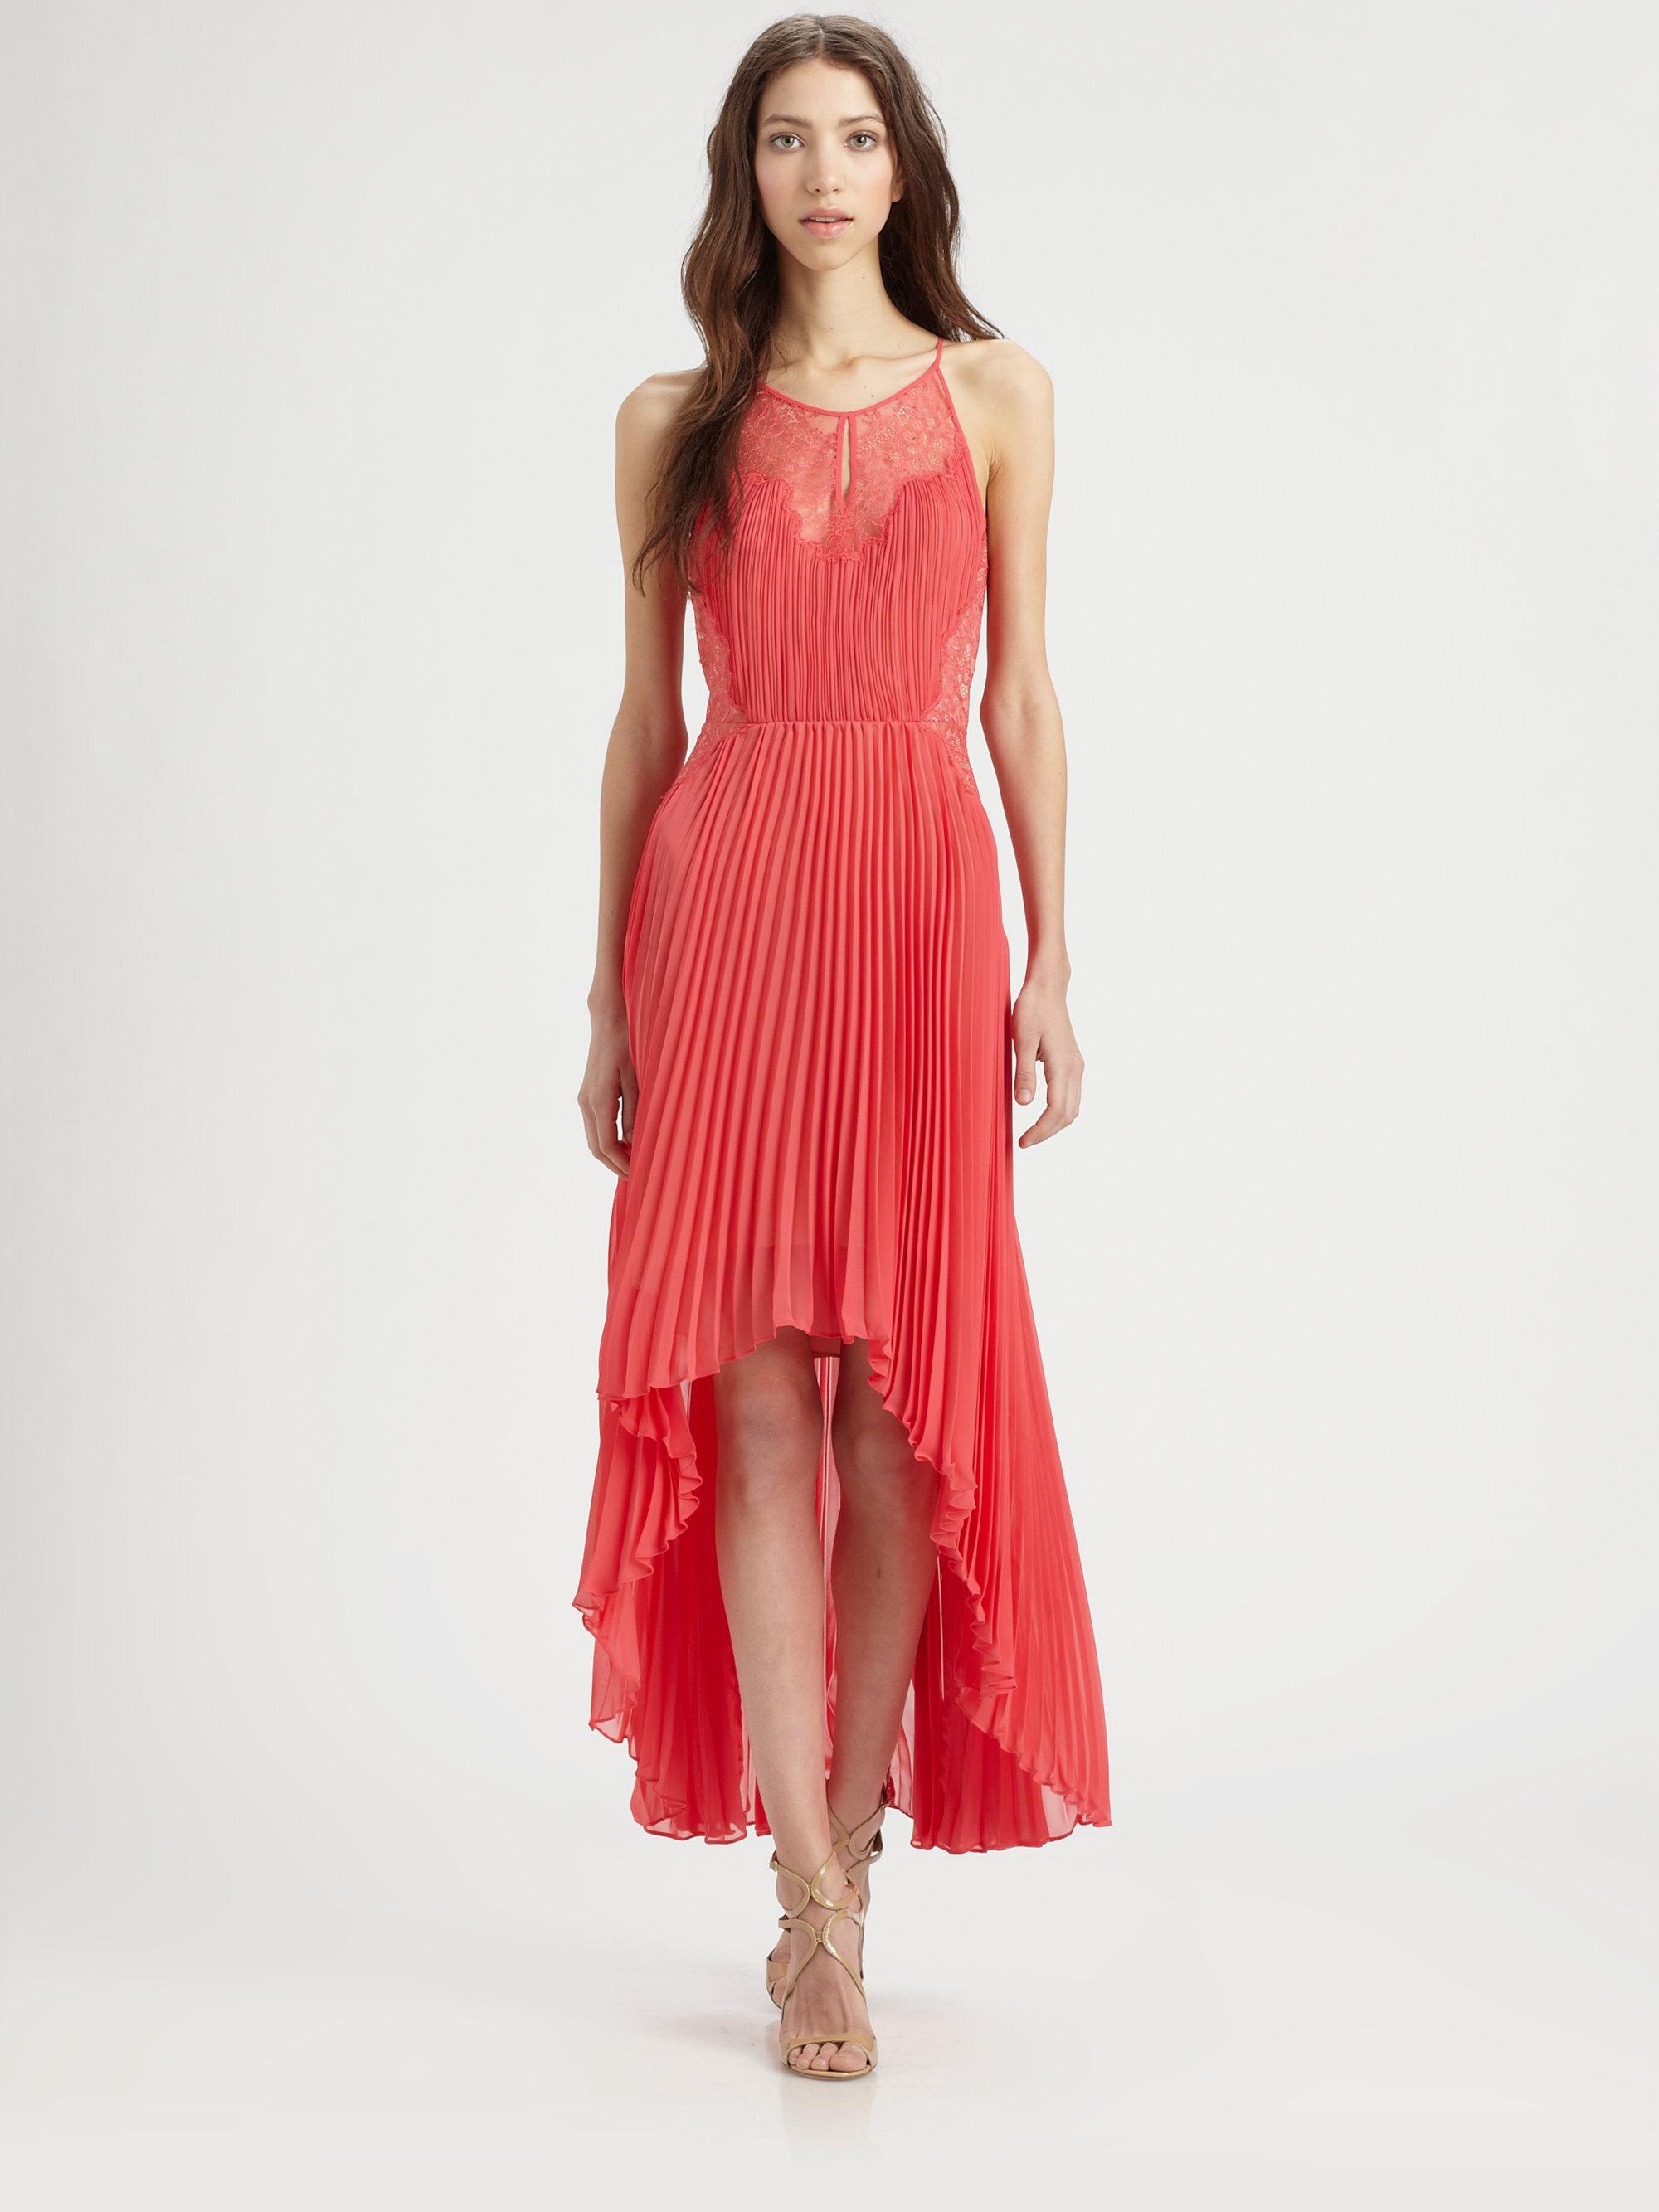 Lyst Bcbgmaxazria Accordion Pleat Lace Dress In Red